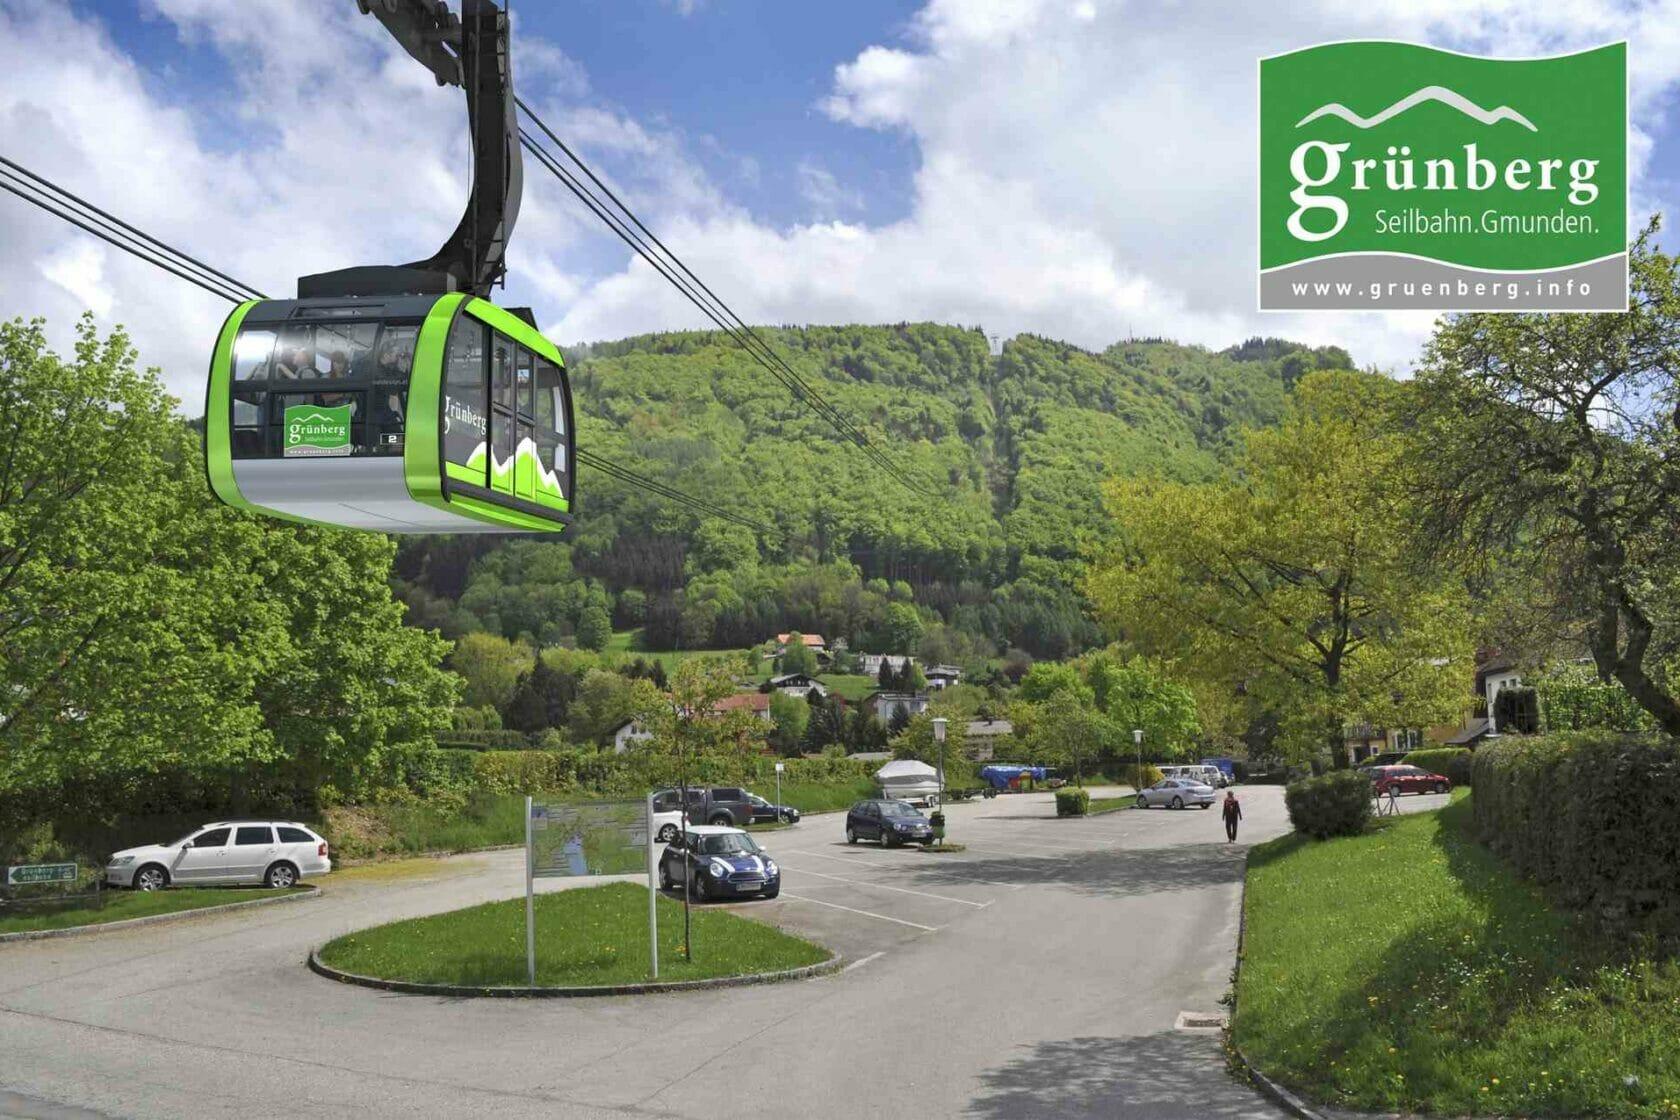 Grünberg in Gmunden